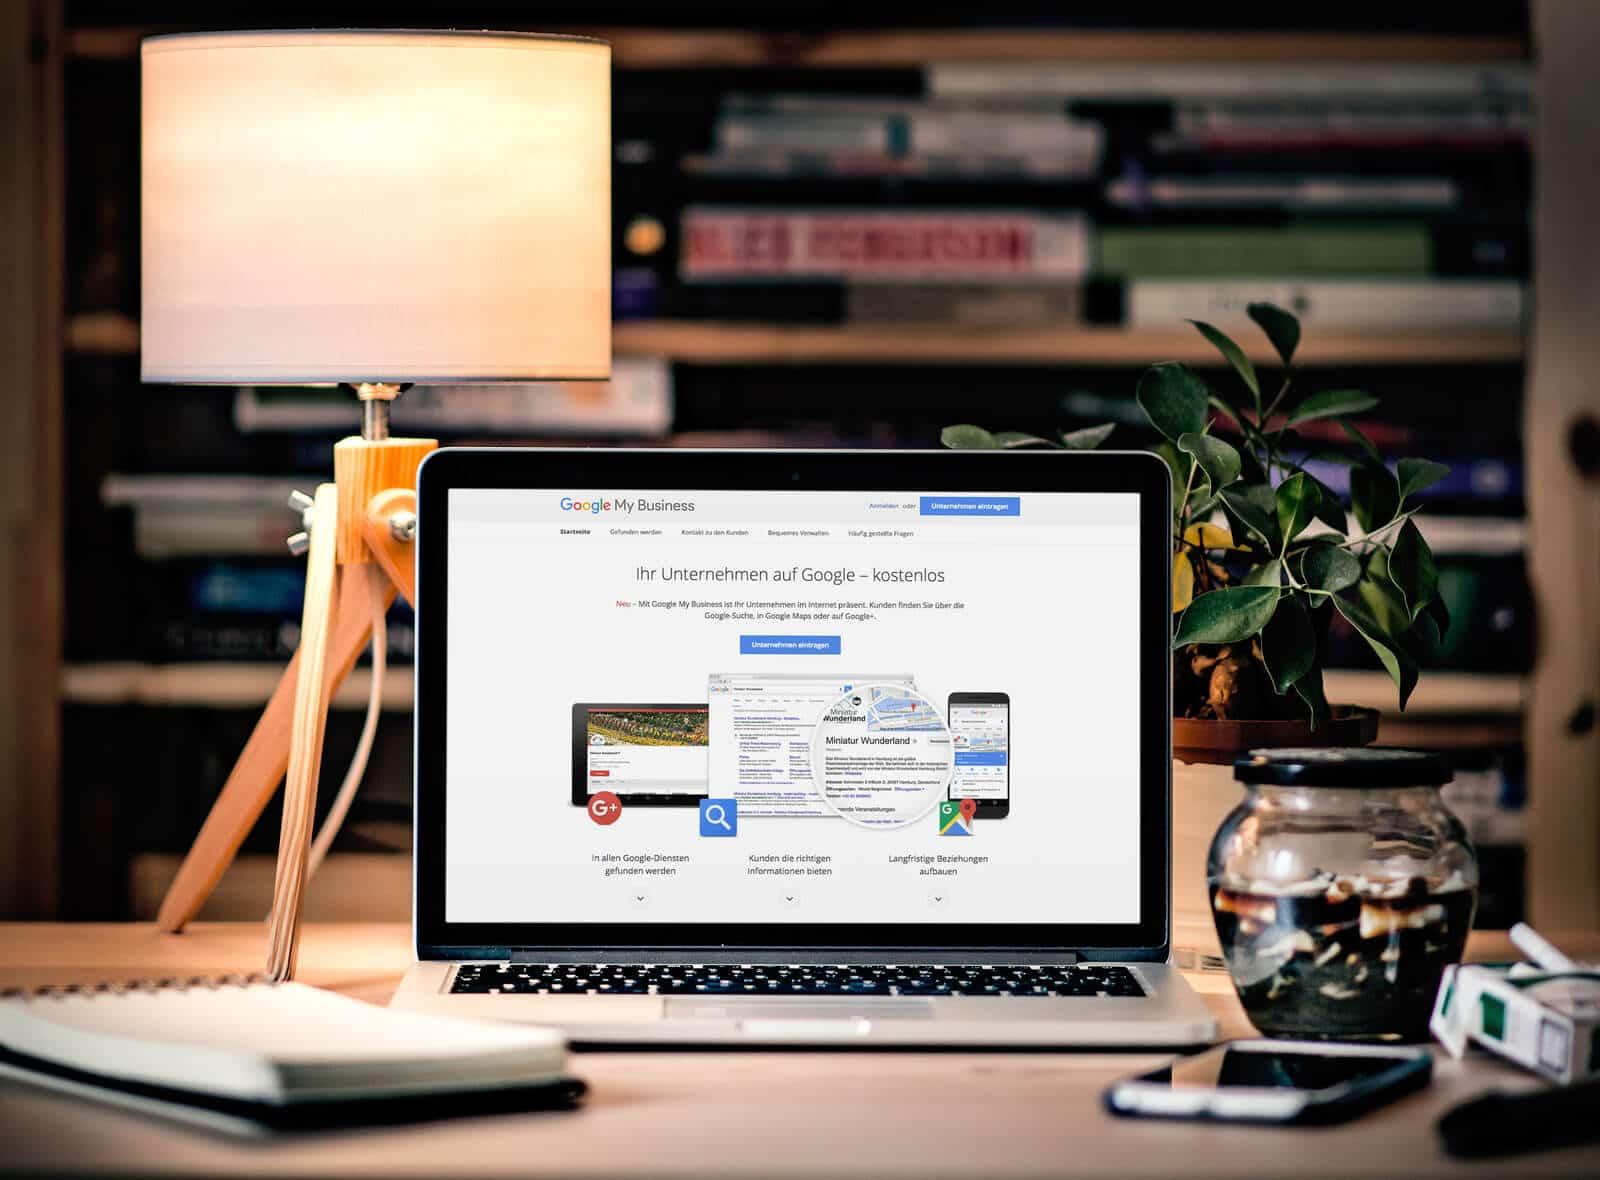 Google My Business verbindet Daten aus verschiedenen Google Produkten